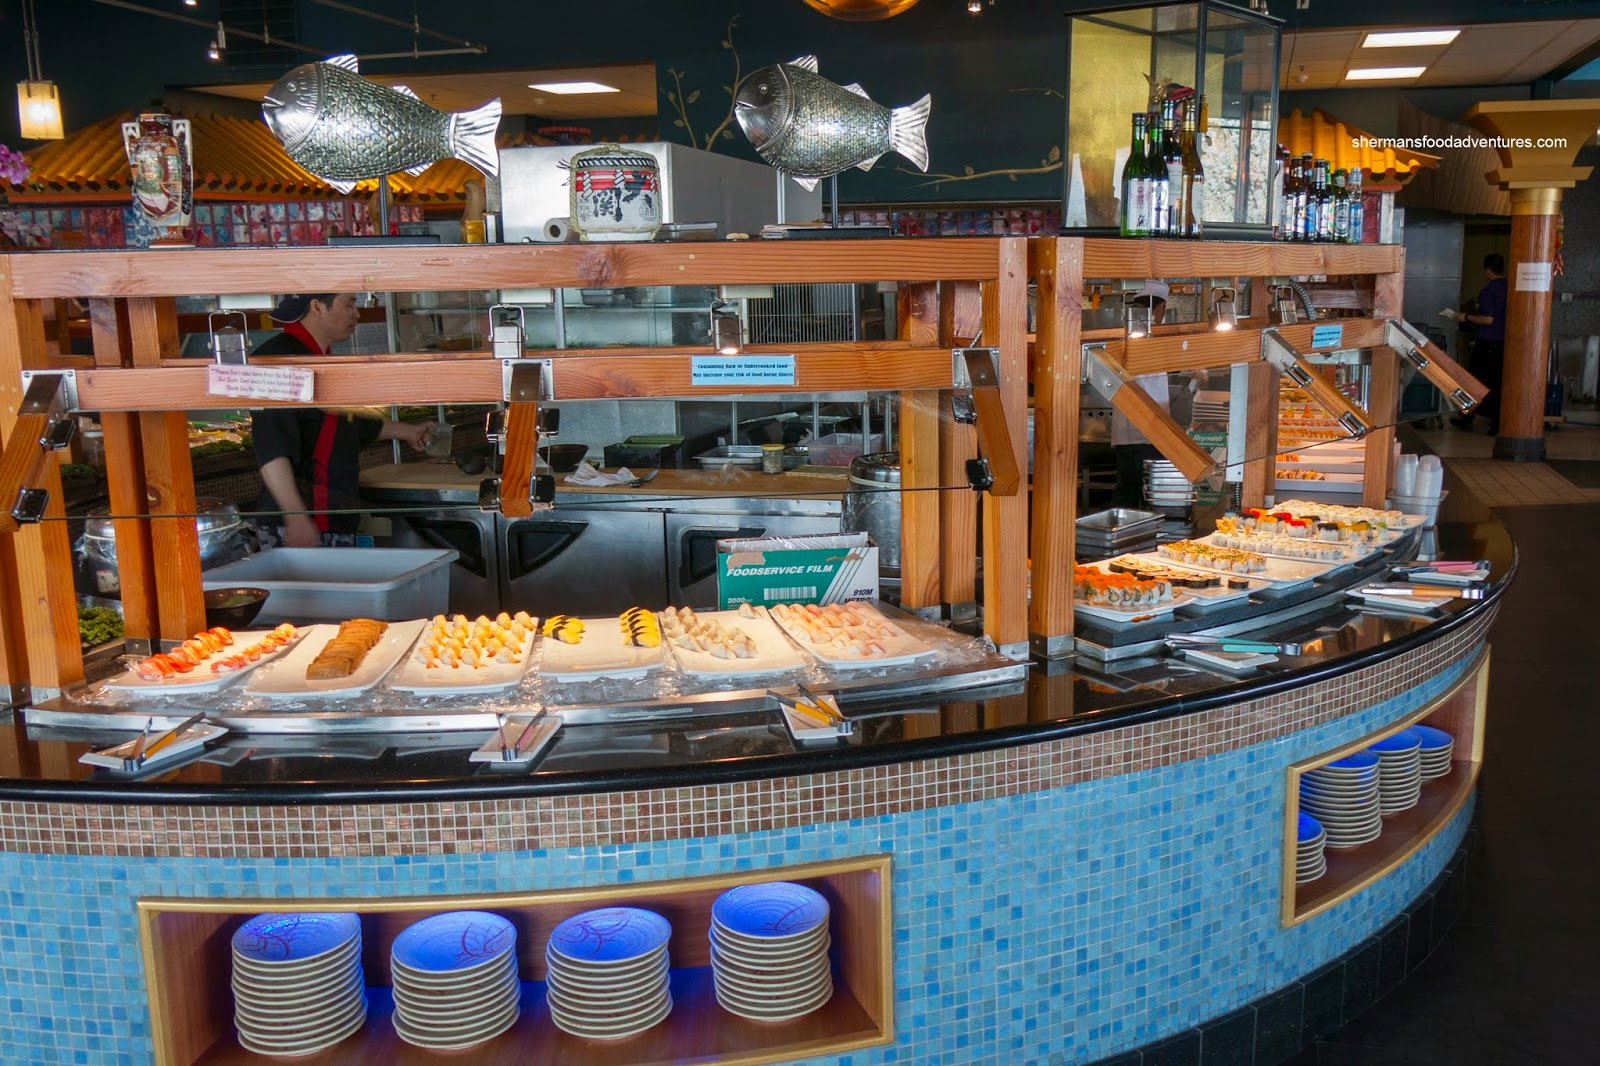 Sherman 39 s food adventures mika buffet - Mika japanese cuisine bar ...